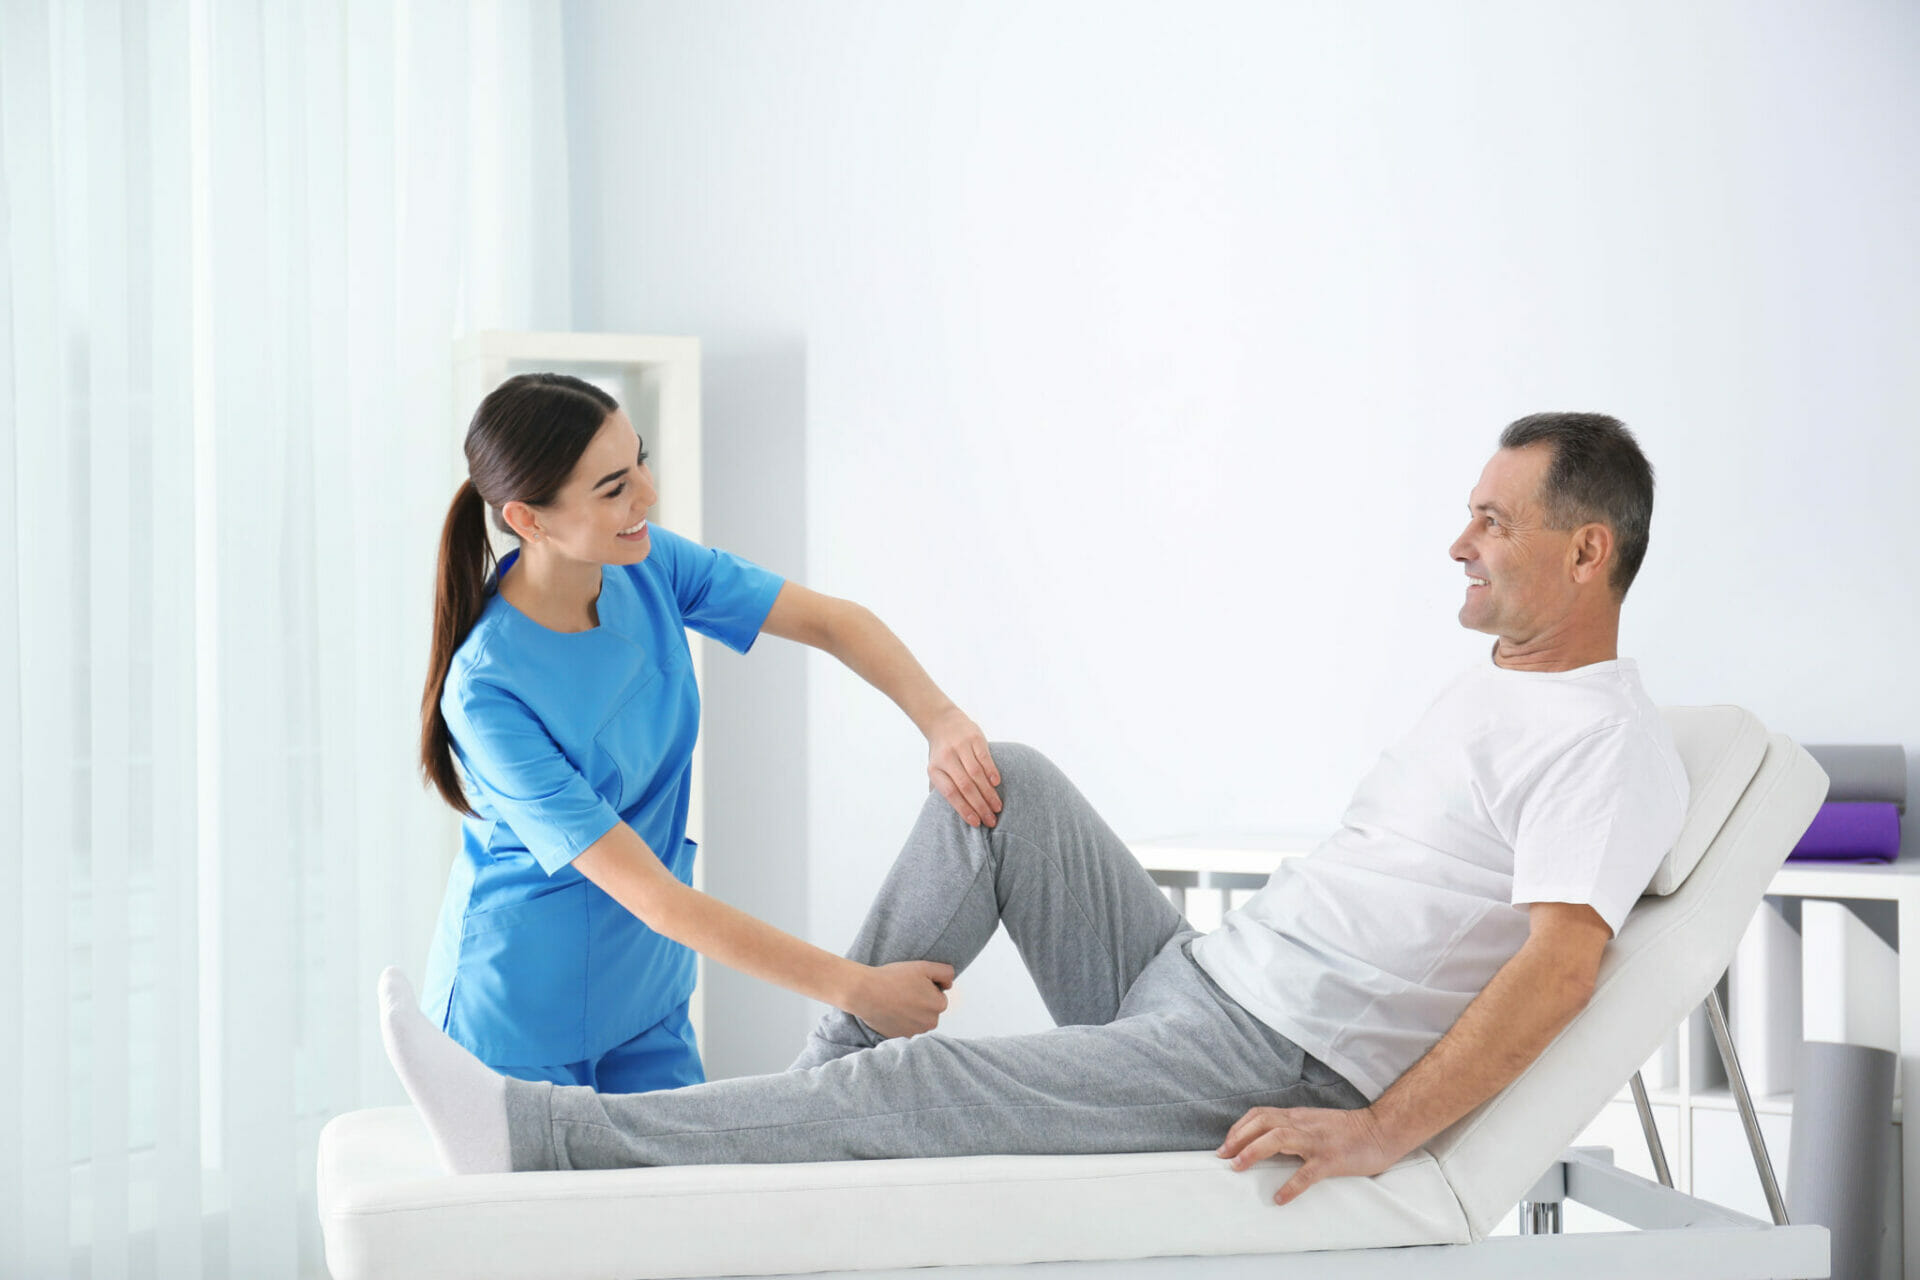 Rehab Exercises for Meniscal (Cartilage) Tear